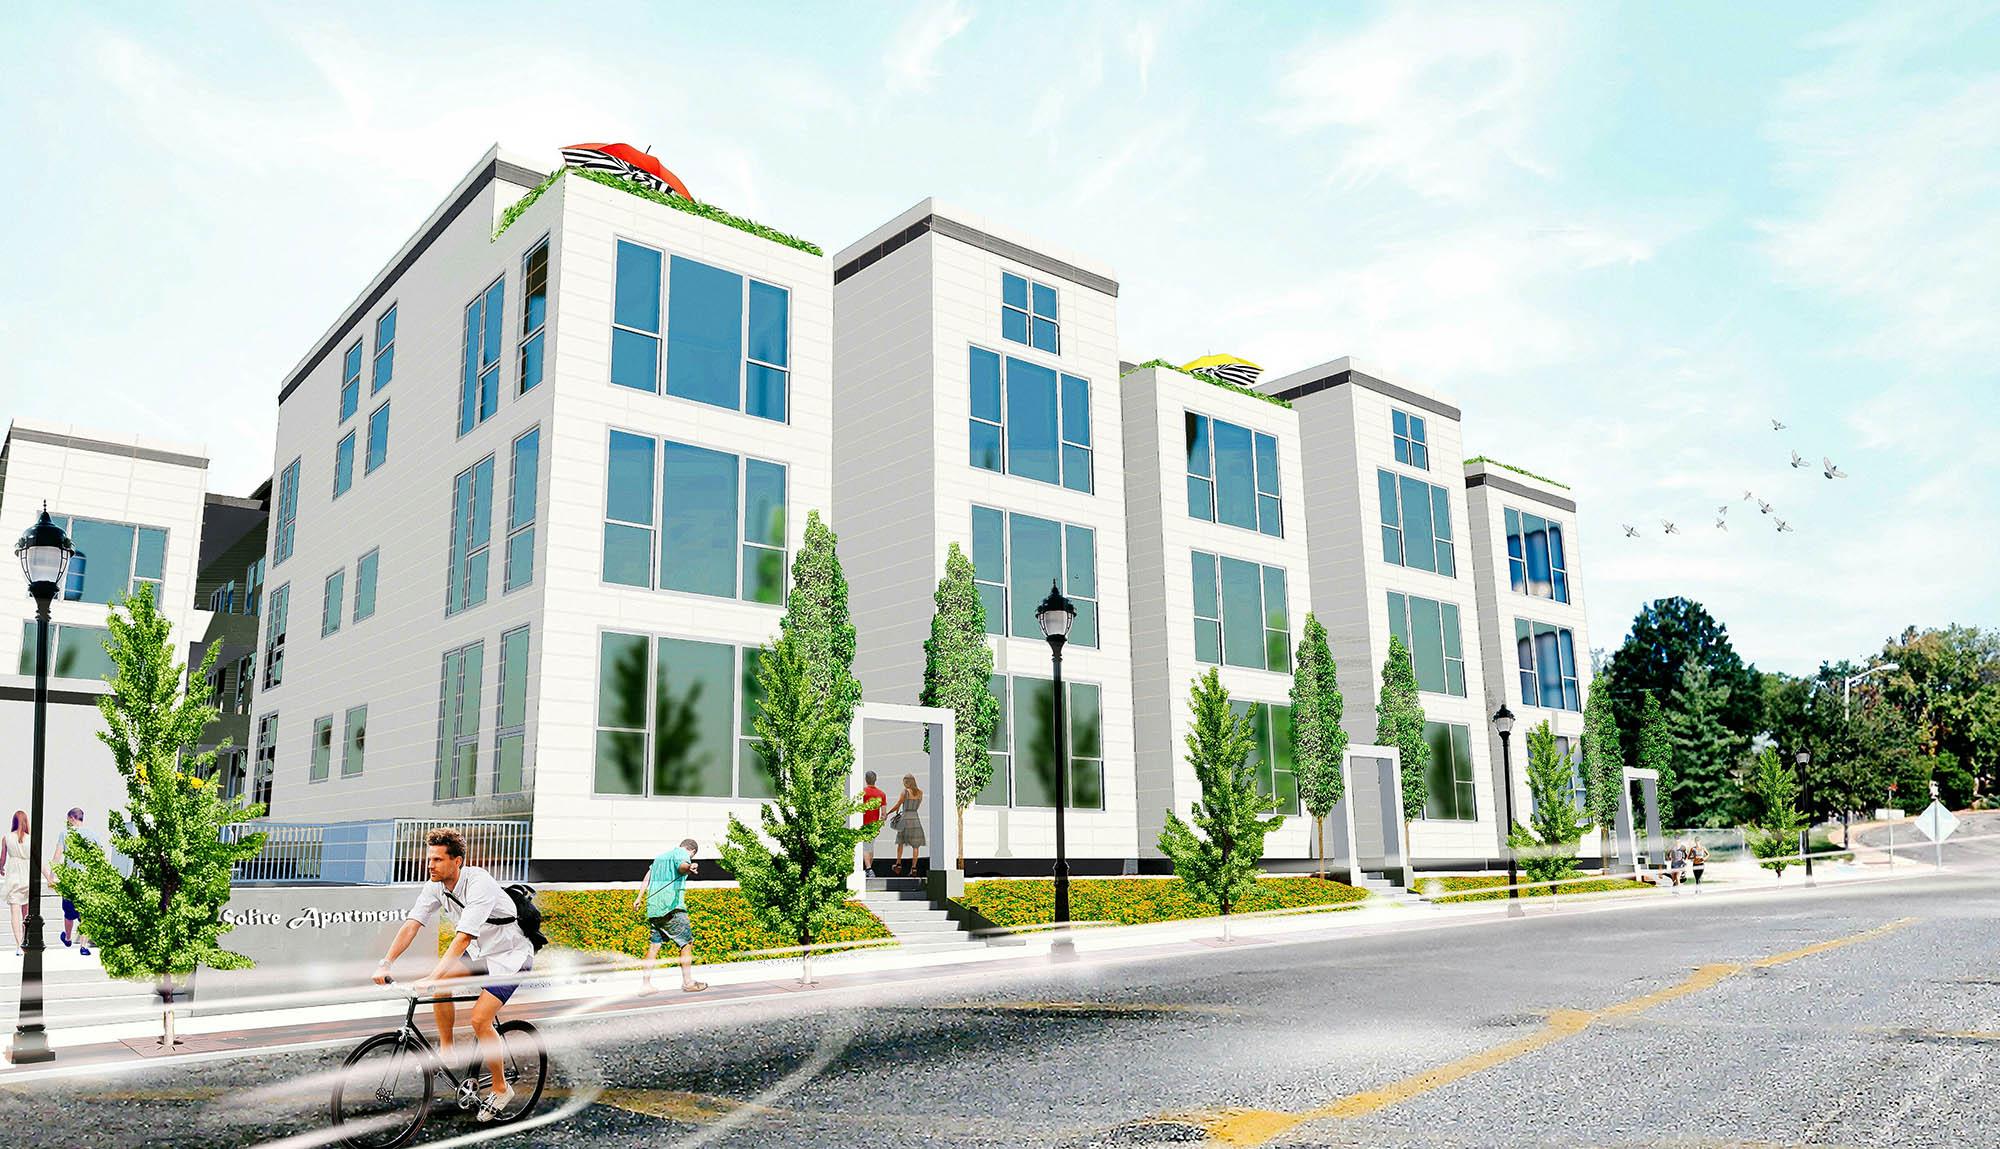 Saur Planning 161 Micro Apartments at Euclid & Delmar nextSTL